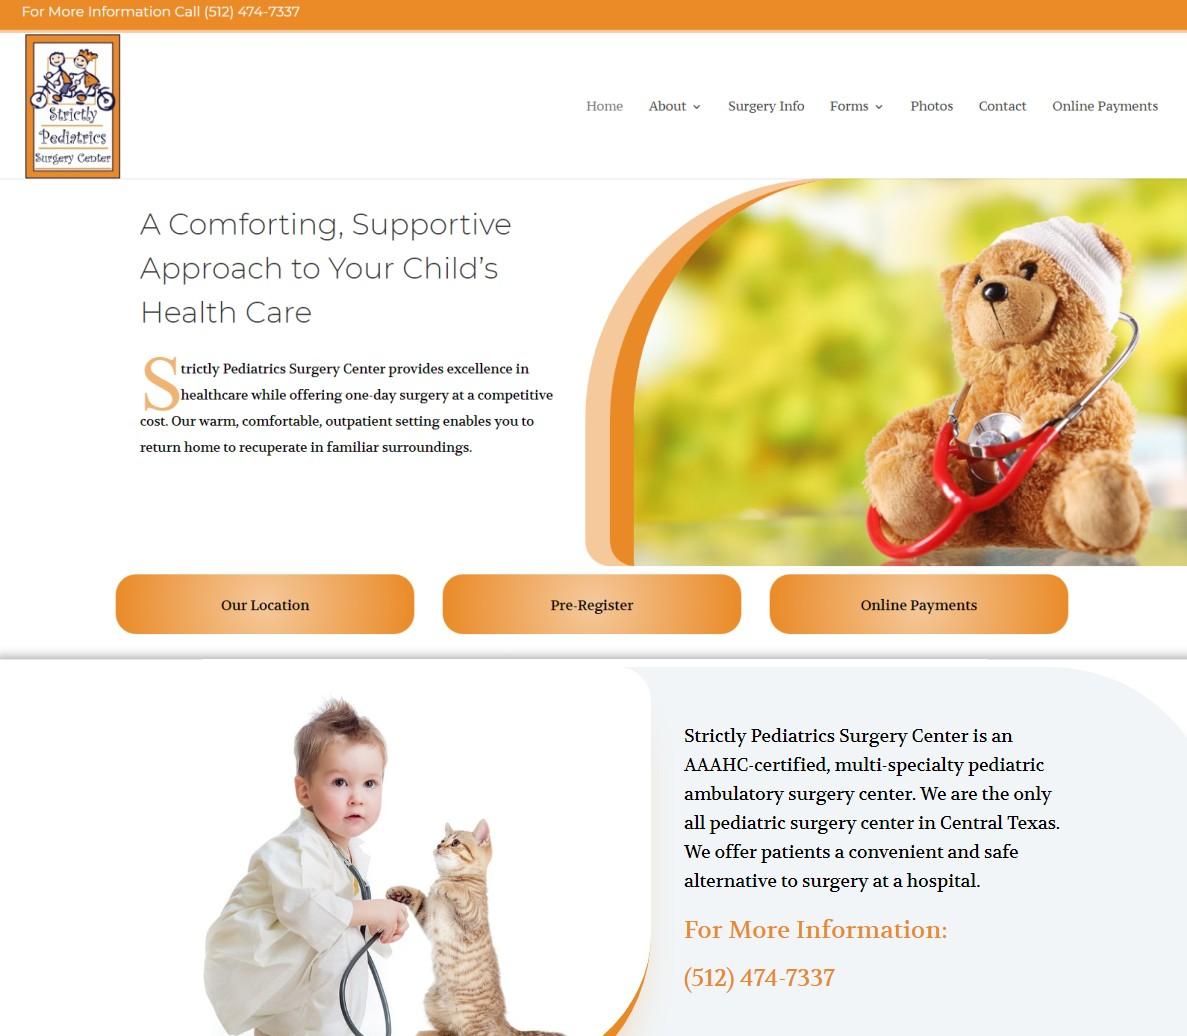 Website Designed for Strictly Pediatrics Surgery Center